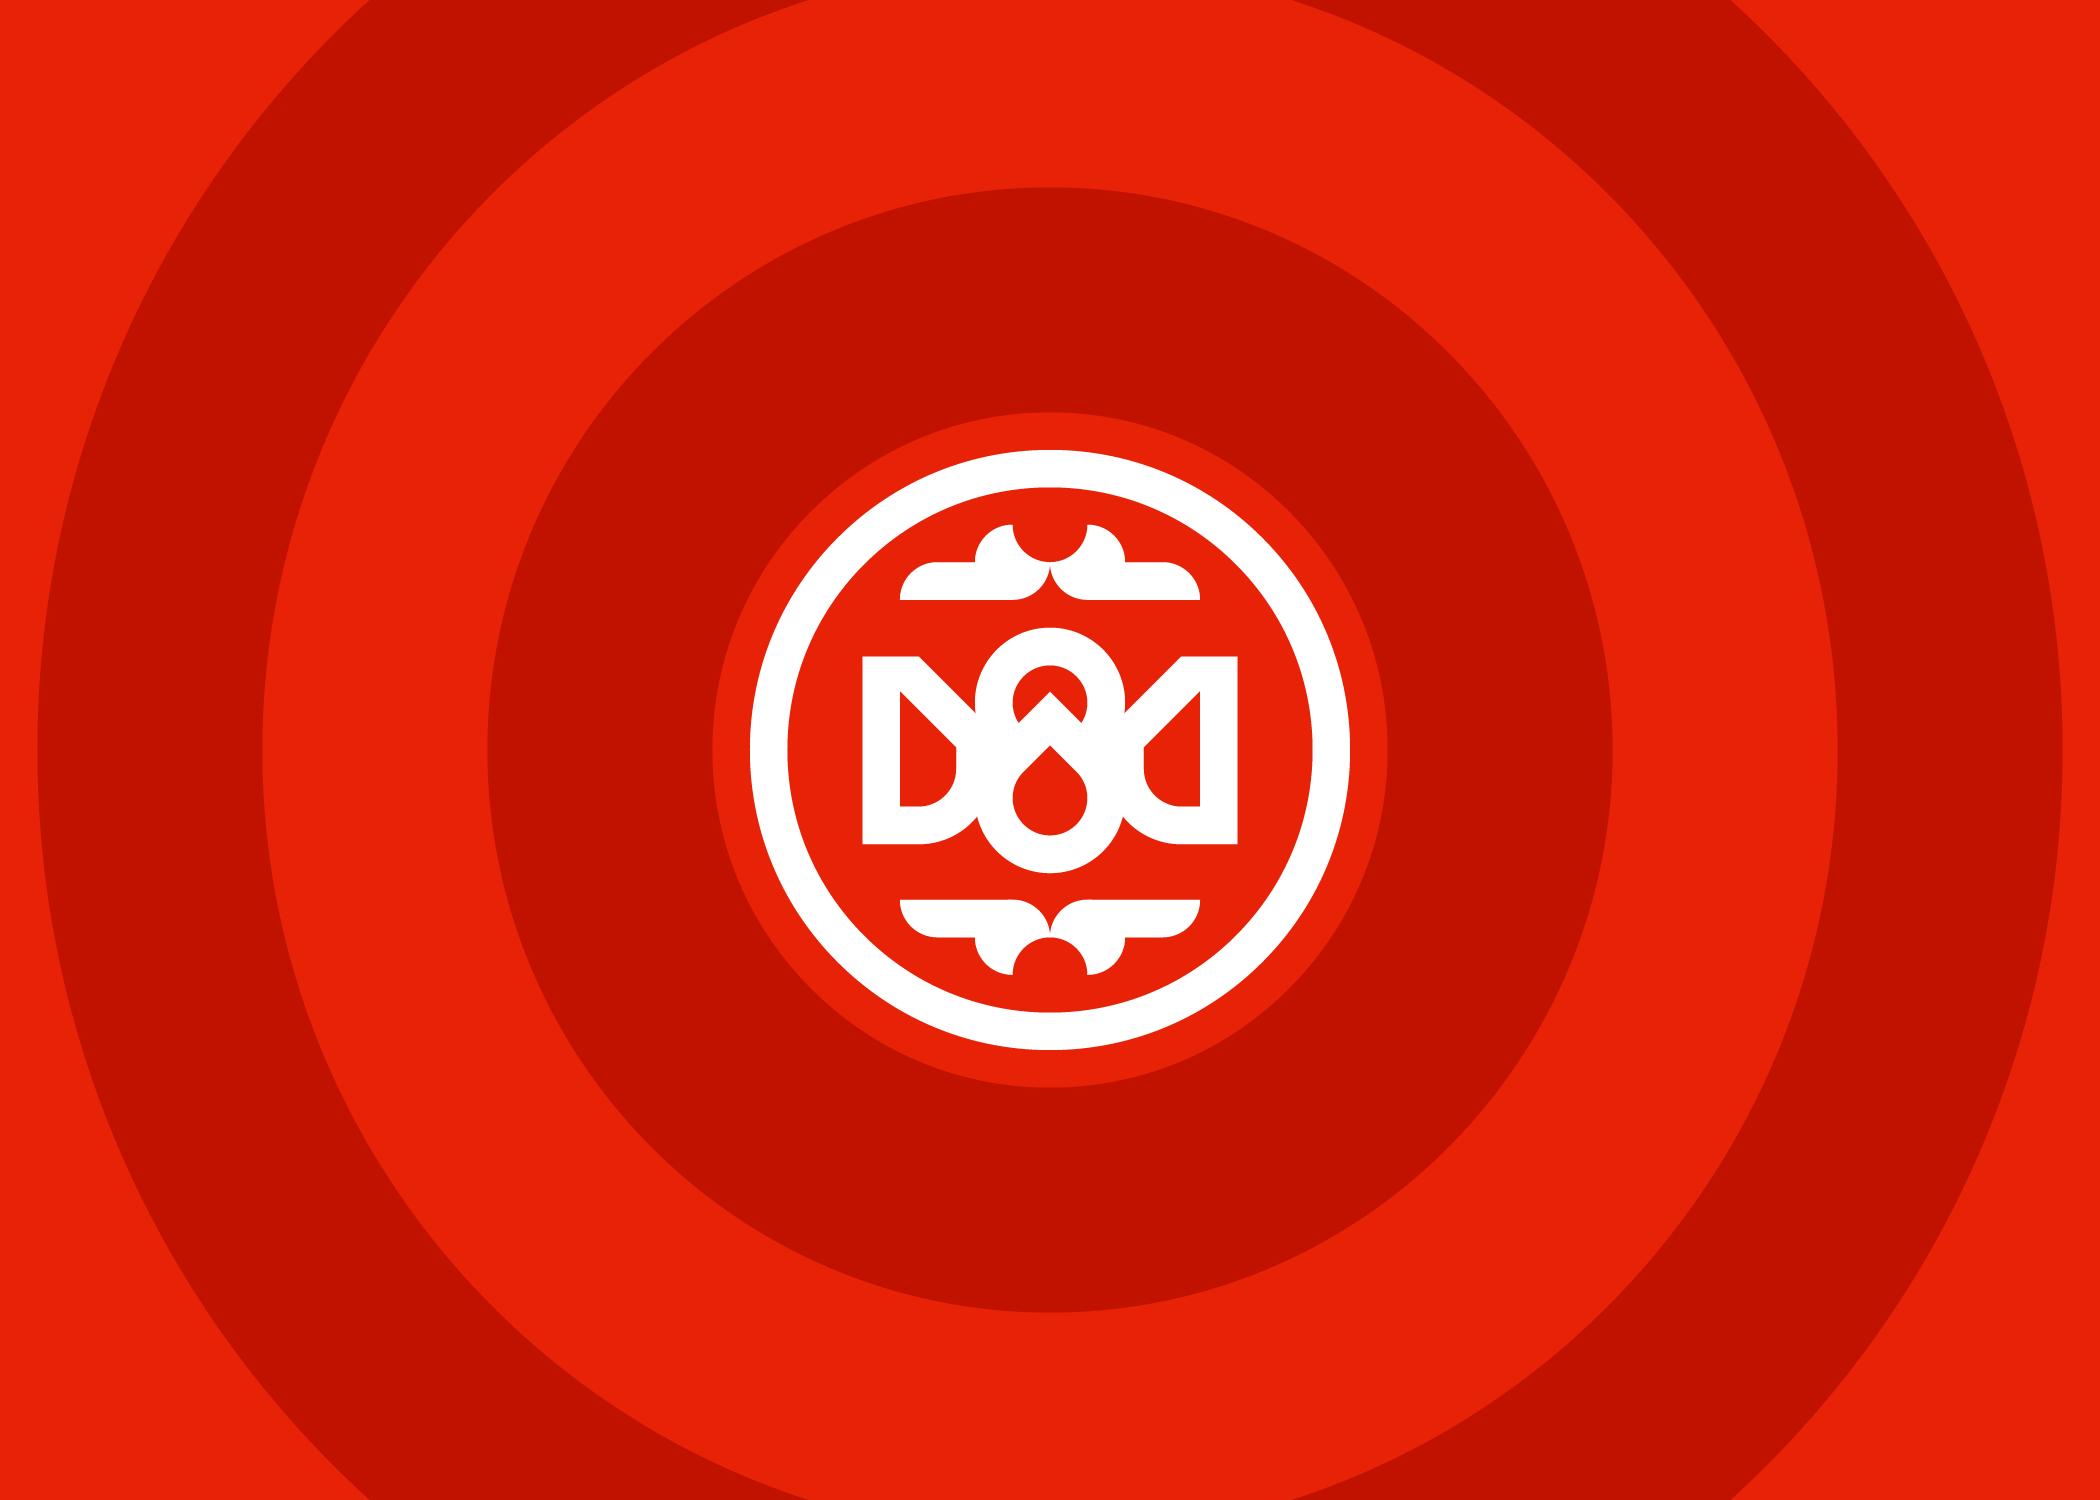 Denmark-2-Geometric-World-Cup-Football-Badge-01-Logo-Design-Freelance-Kent.png